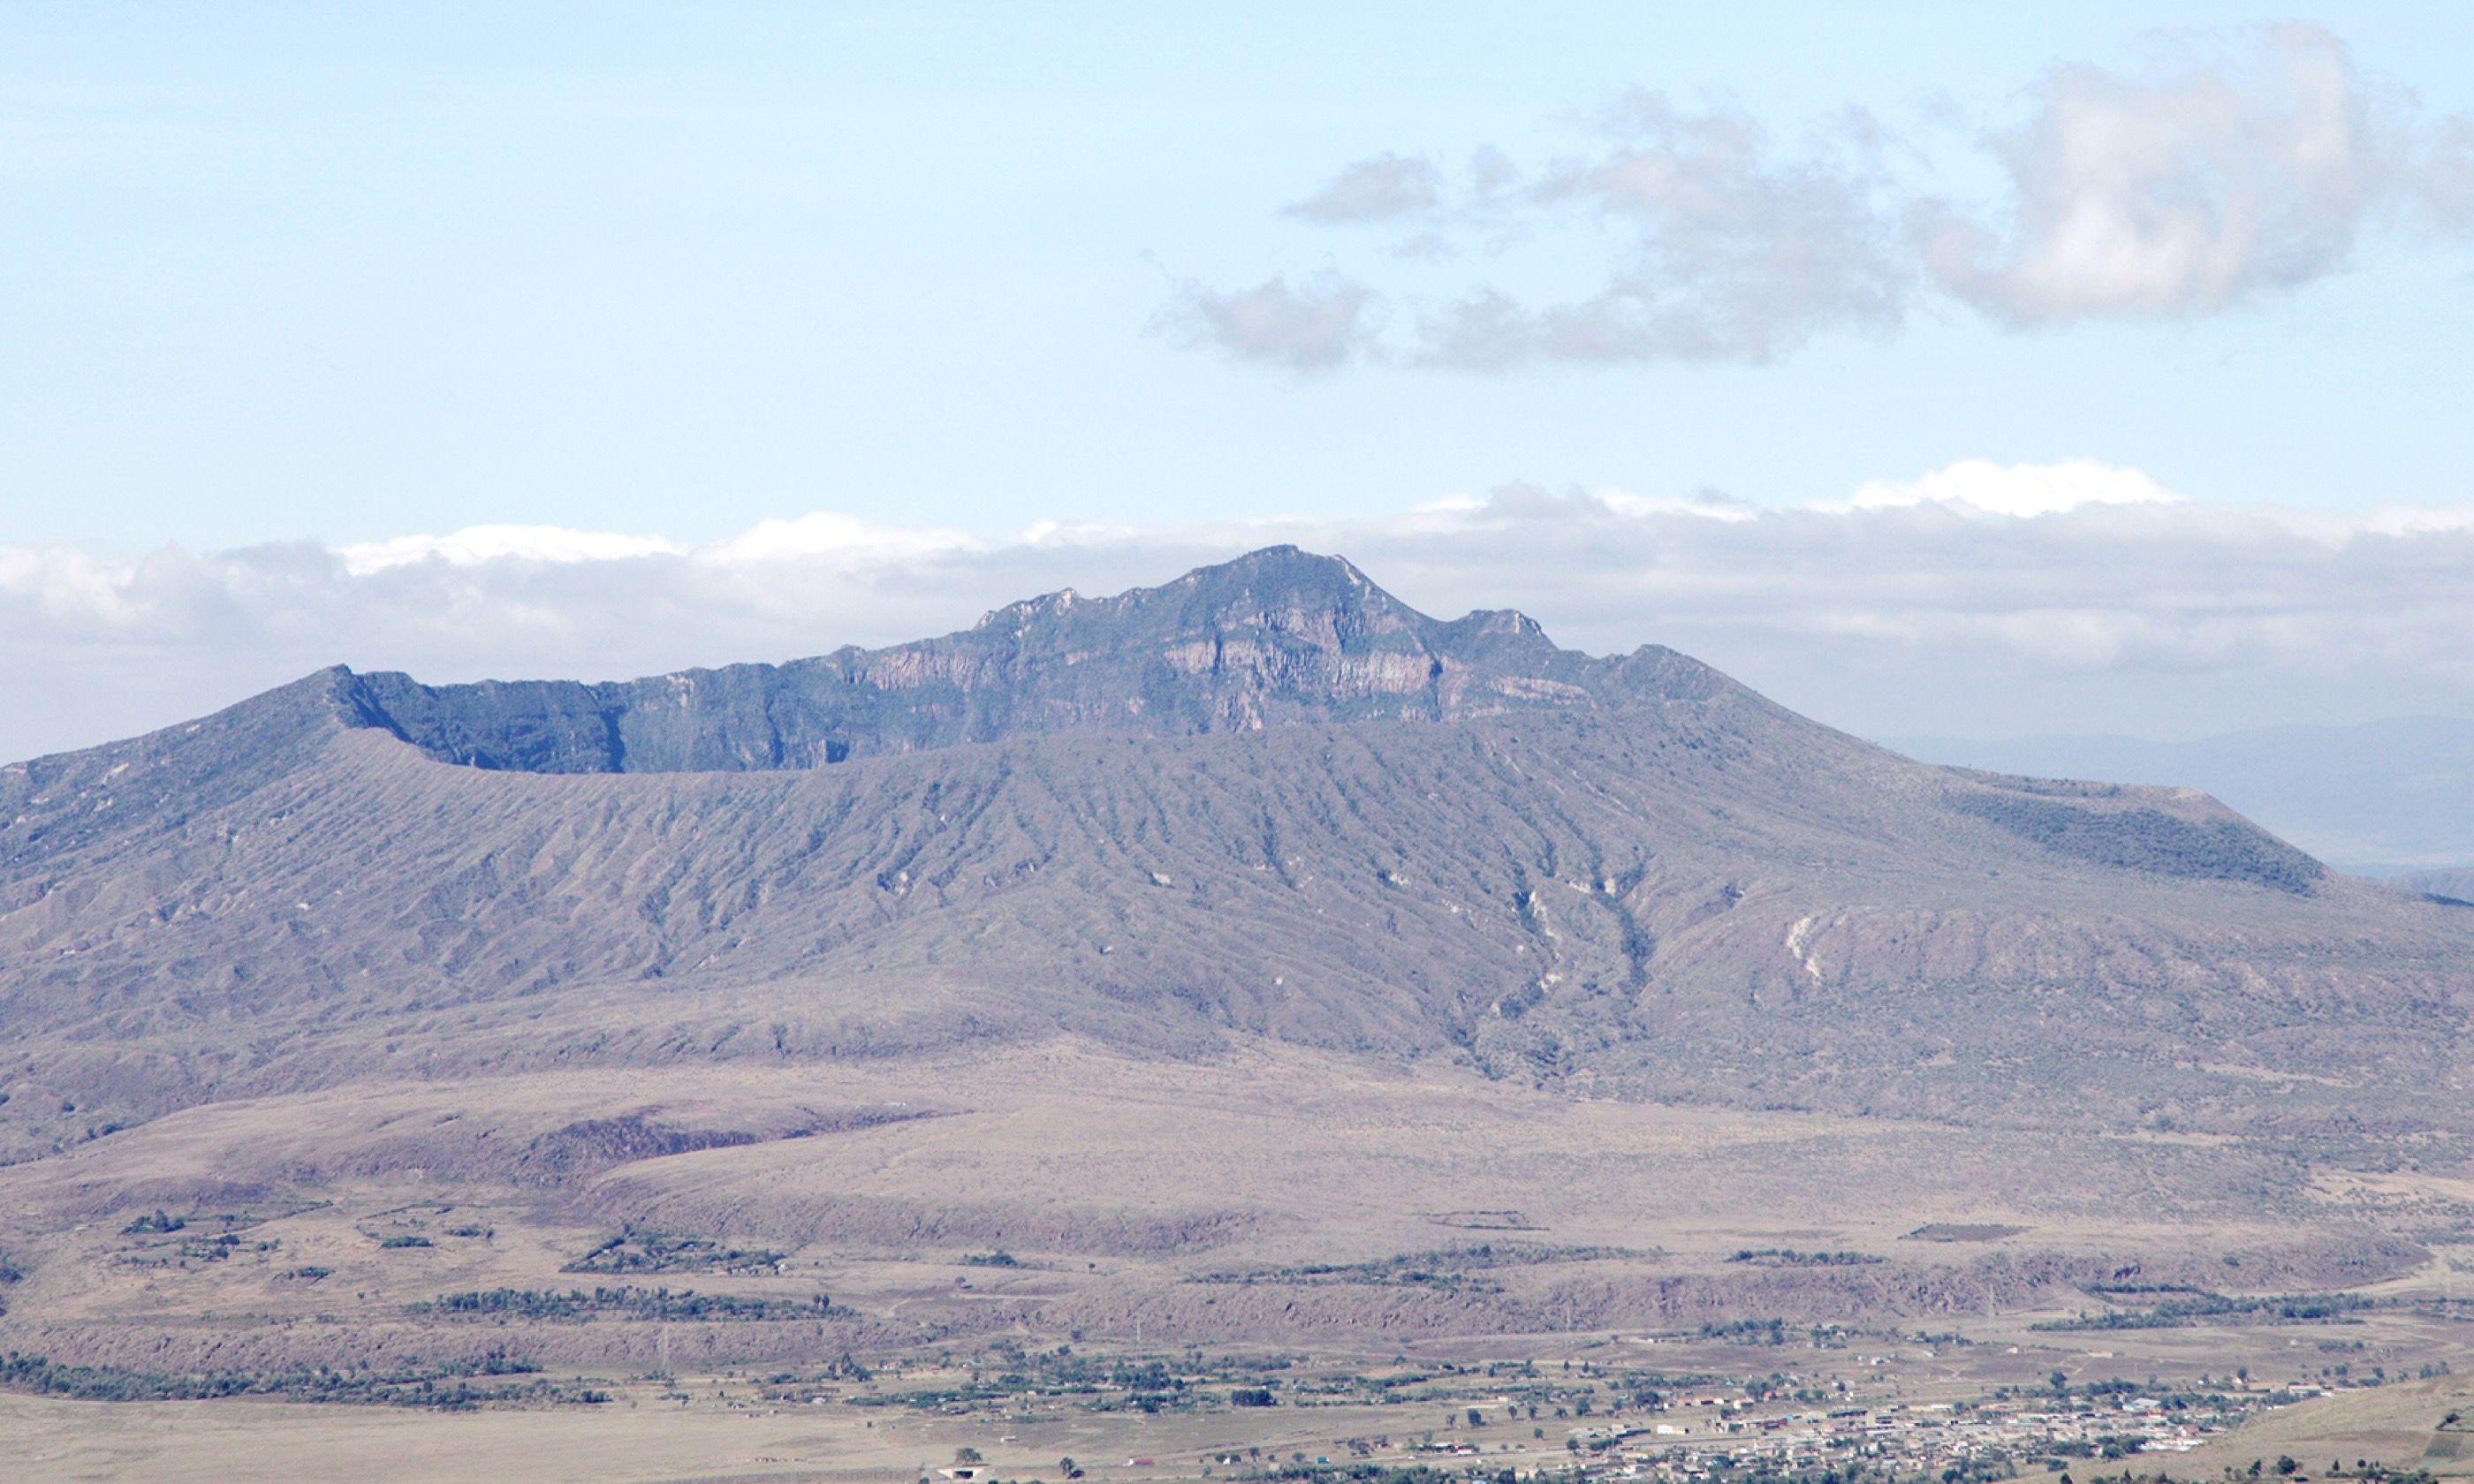 Longonot Crater, Kenya (Shutterstock.com)